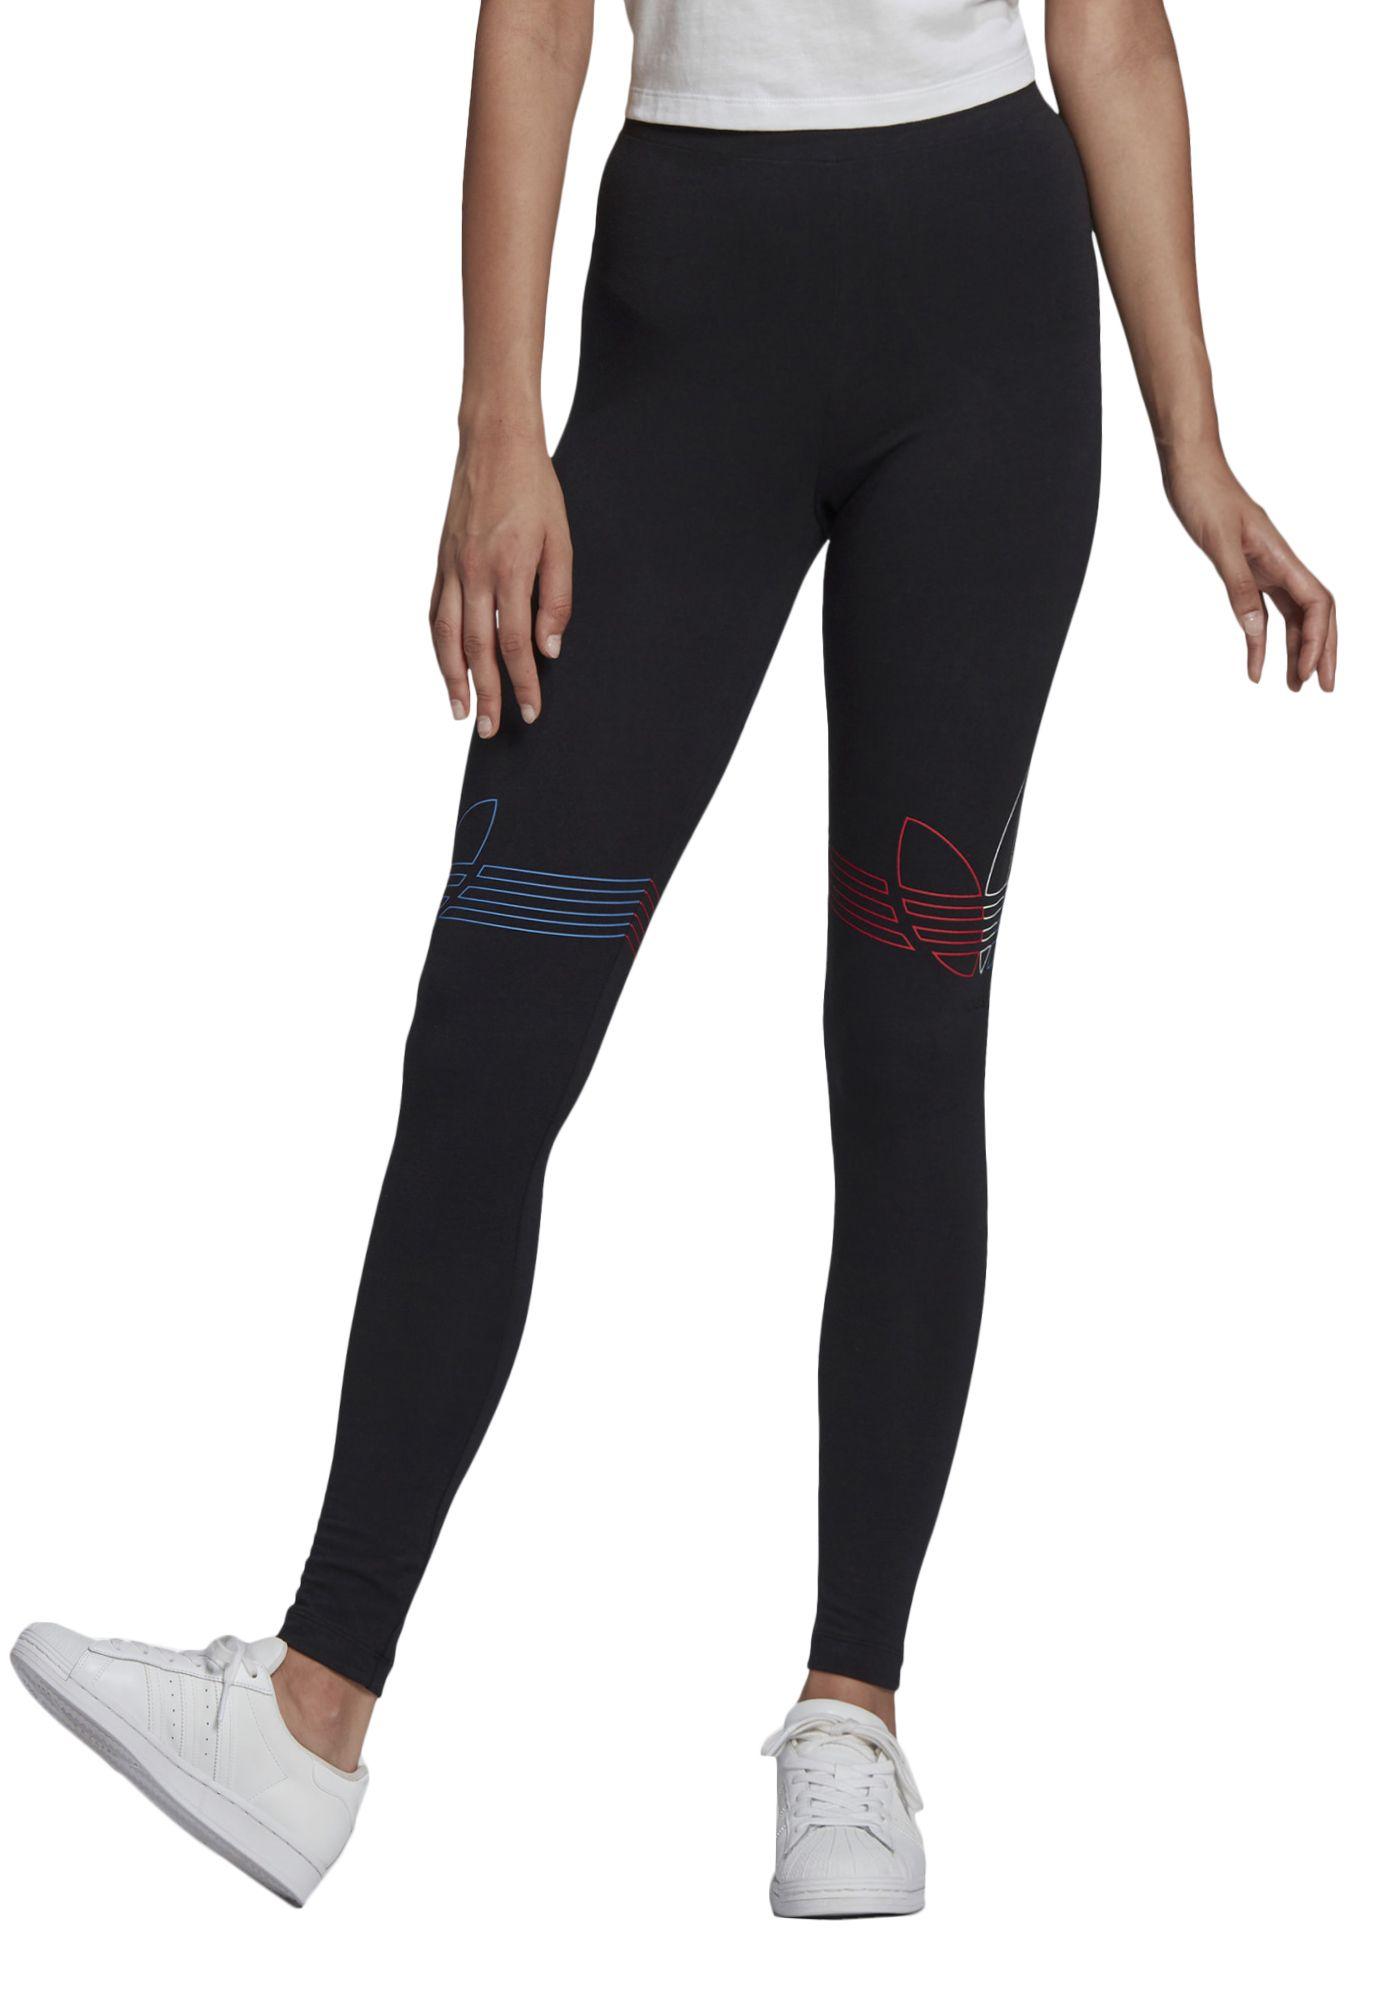 Calças Adidas TIGHTS Black